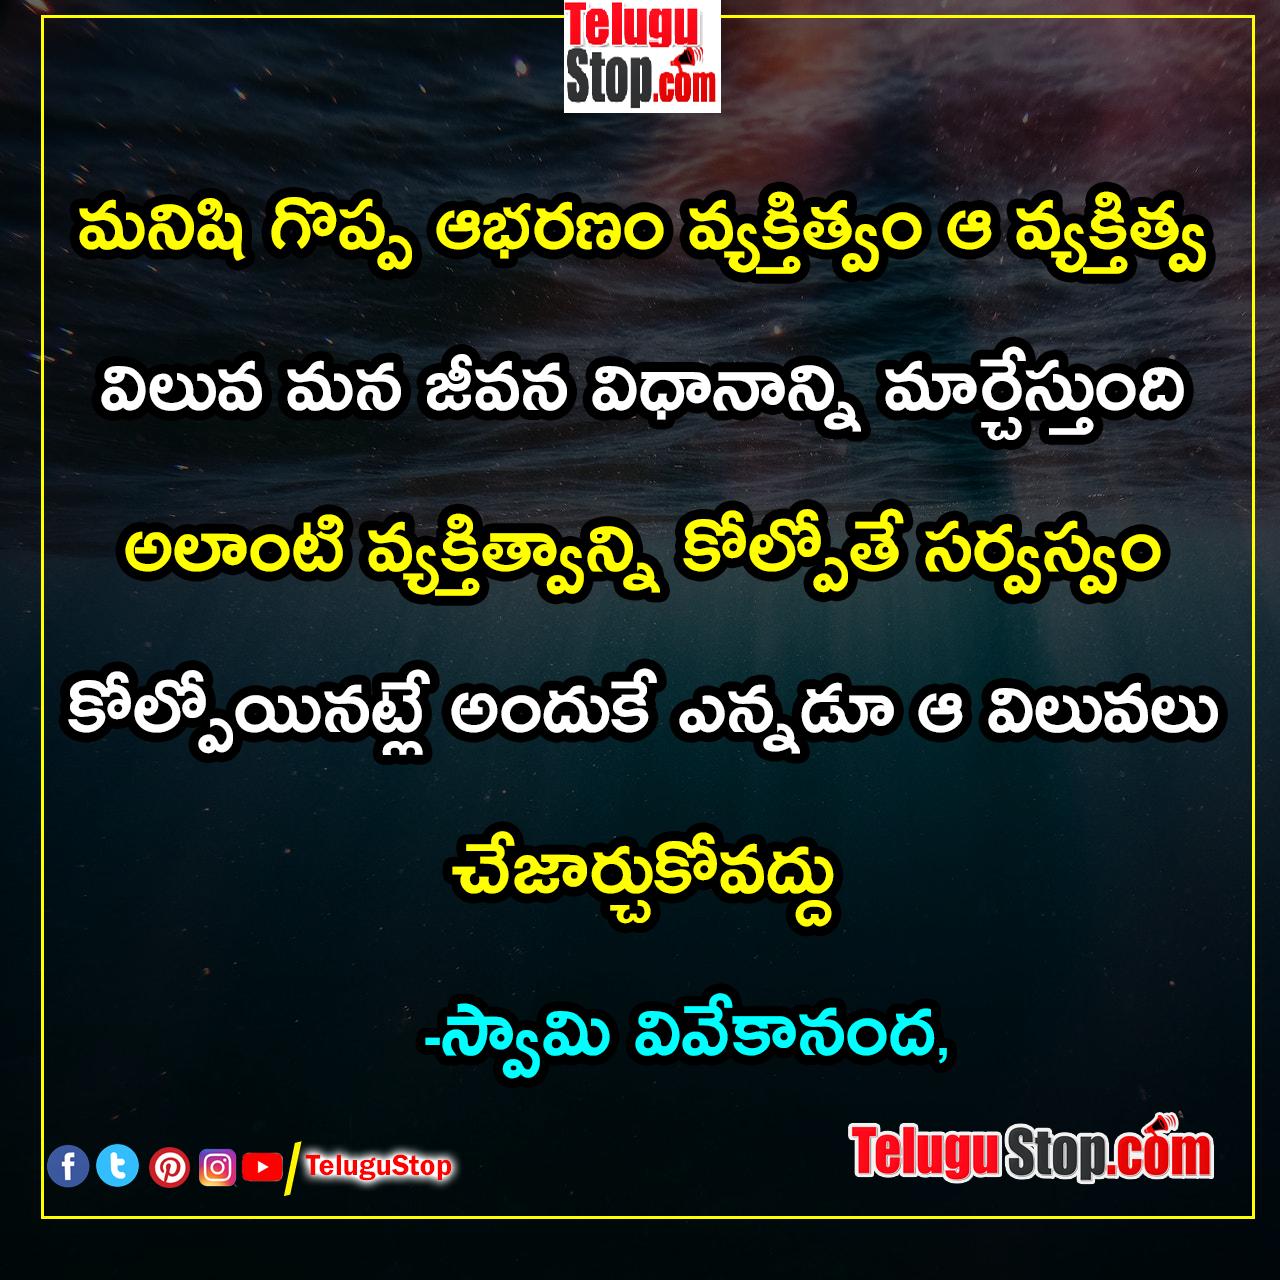 TeluguStop.com - Swami Vivekananda Inspirational Quotes In Telugu-తెలుగులో స్వామి వివేకానంద స్ఫూర్తిదాయకమైన కోట్స్-Telugu Quotes - Daily Inspirational/Motivational/Love/Friendship/Festival/Life Style/Good Morning WhatsApp Social-Telugu Tollywood Photo Image